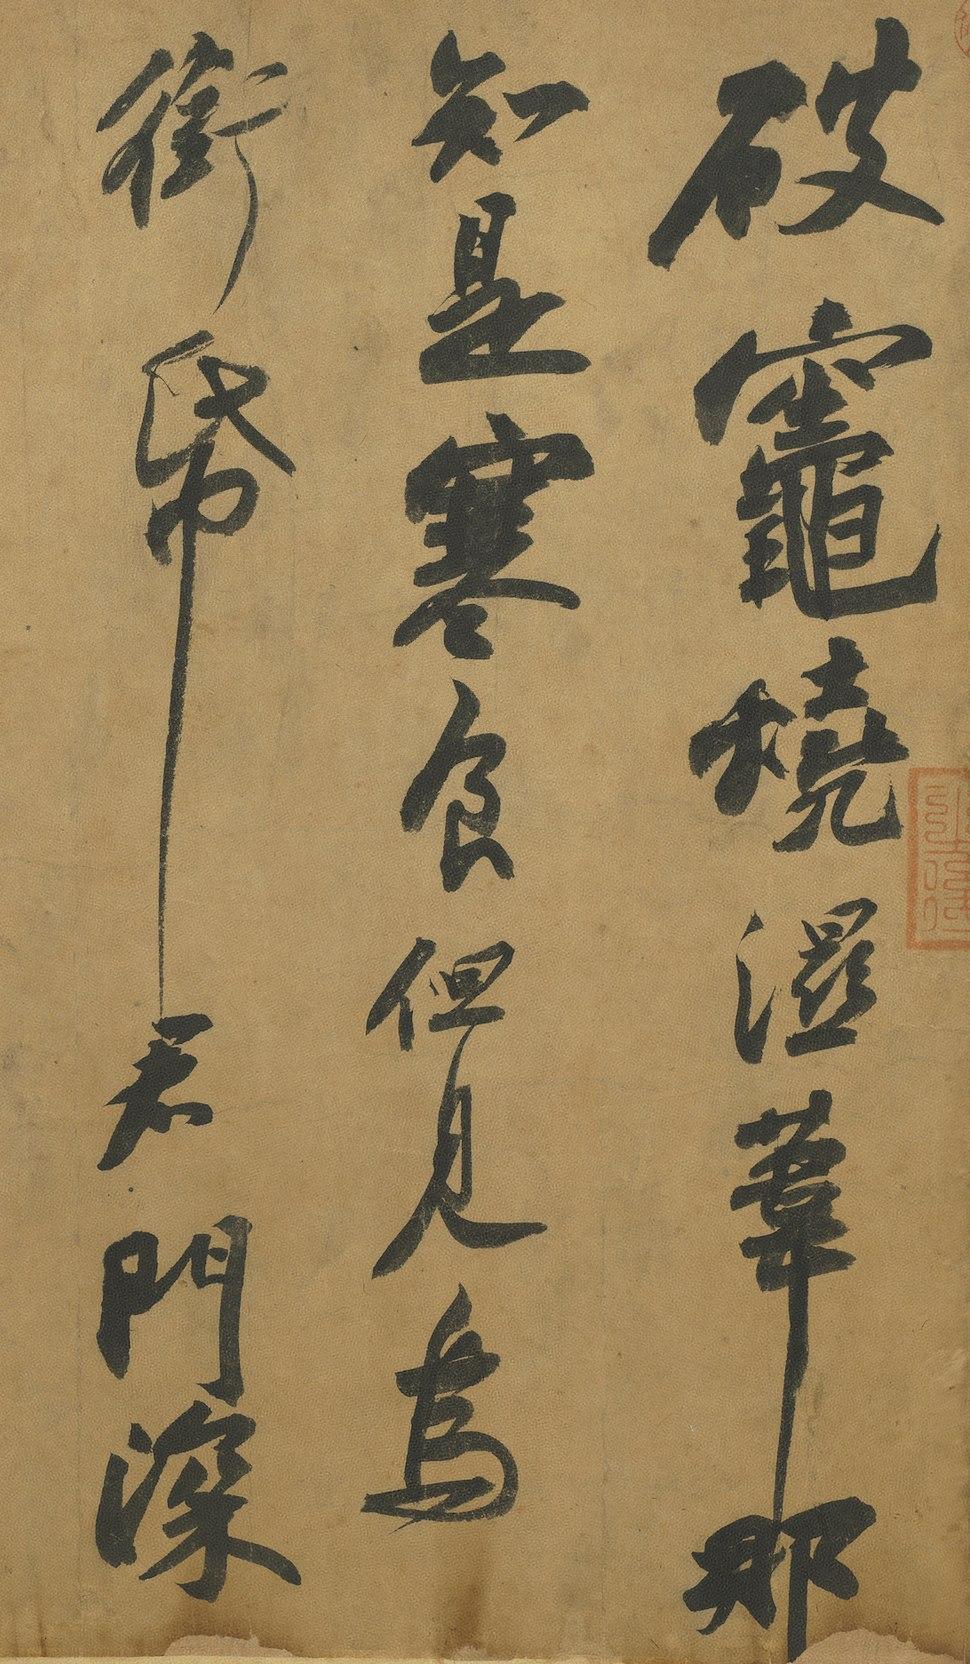 Su shi-calligraphy